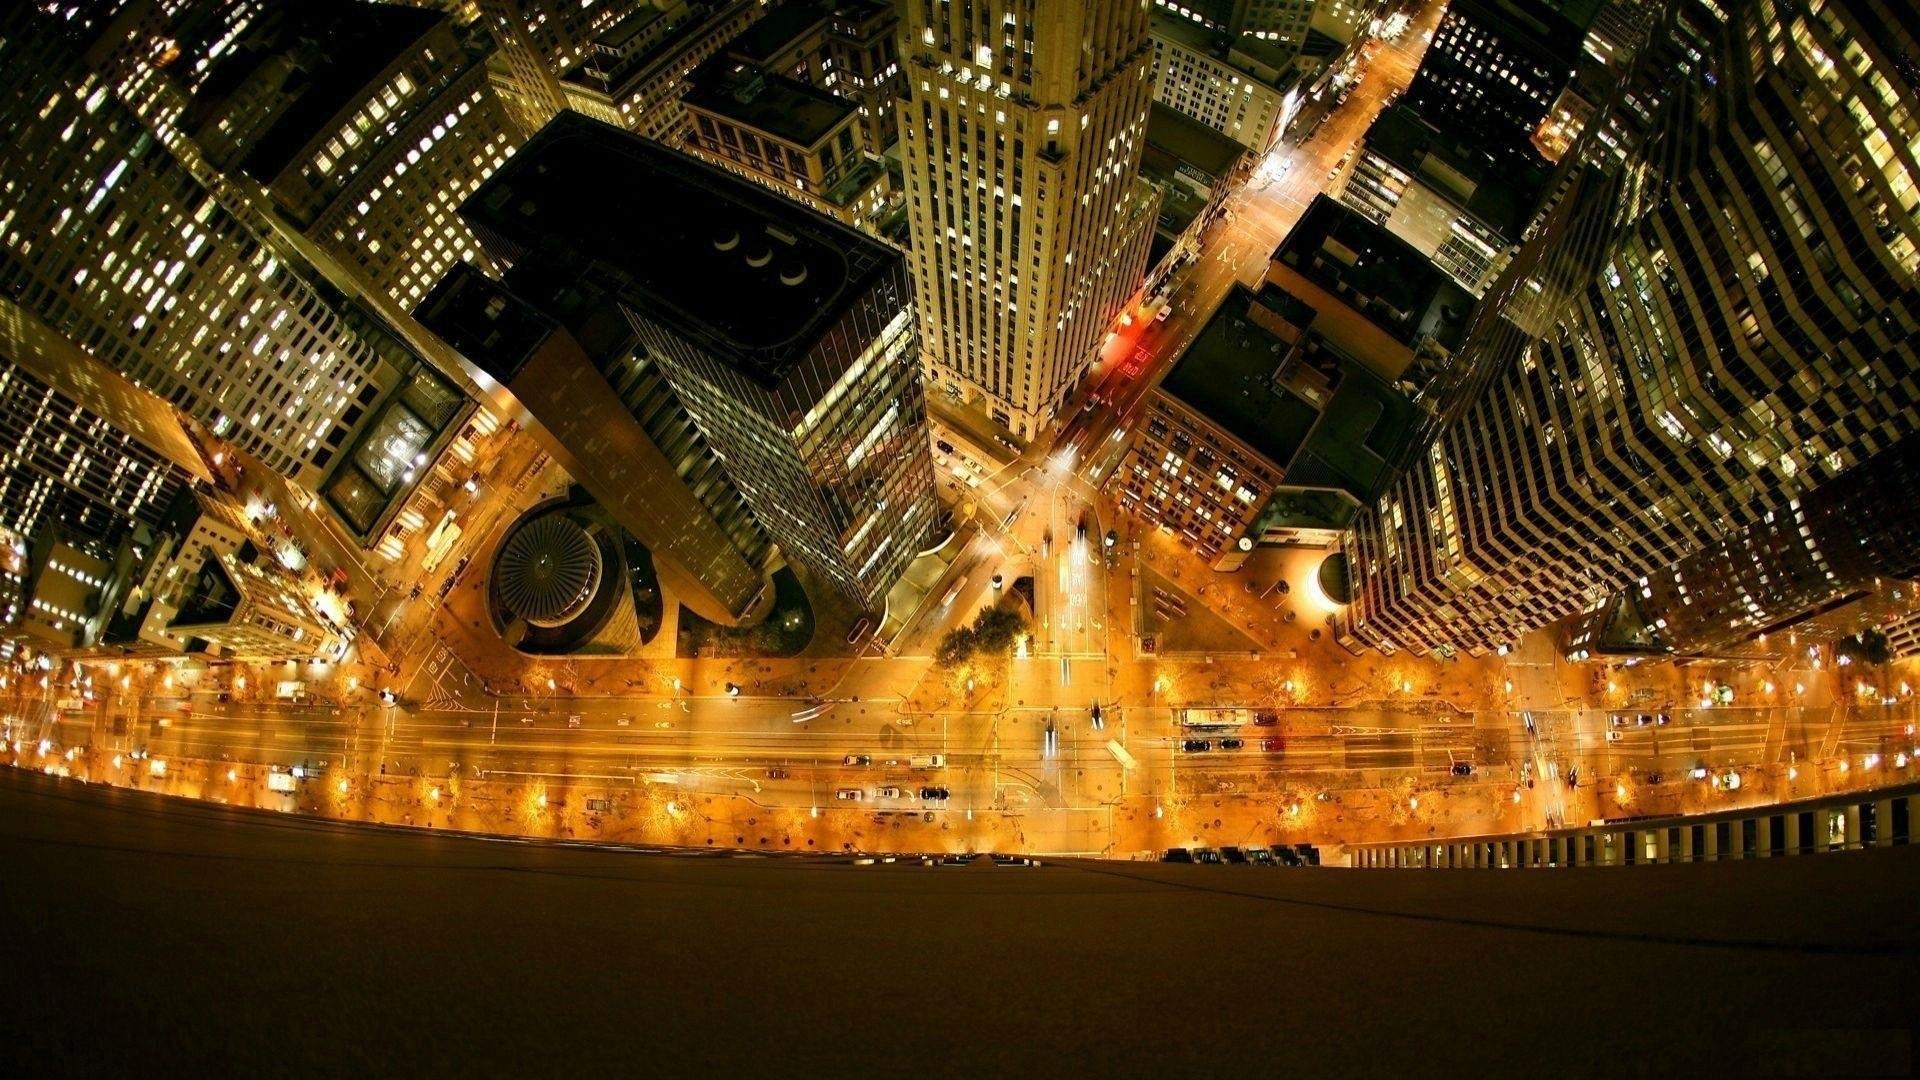 General 1920x1080 cityscape lights building skyscraper New York City USA street light night street car window bird's eye view city lights